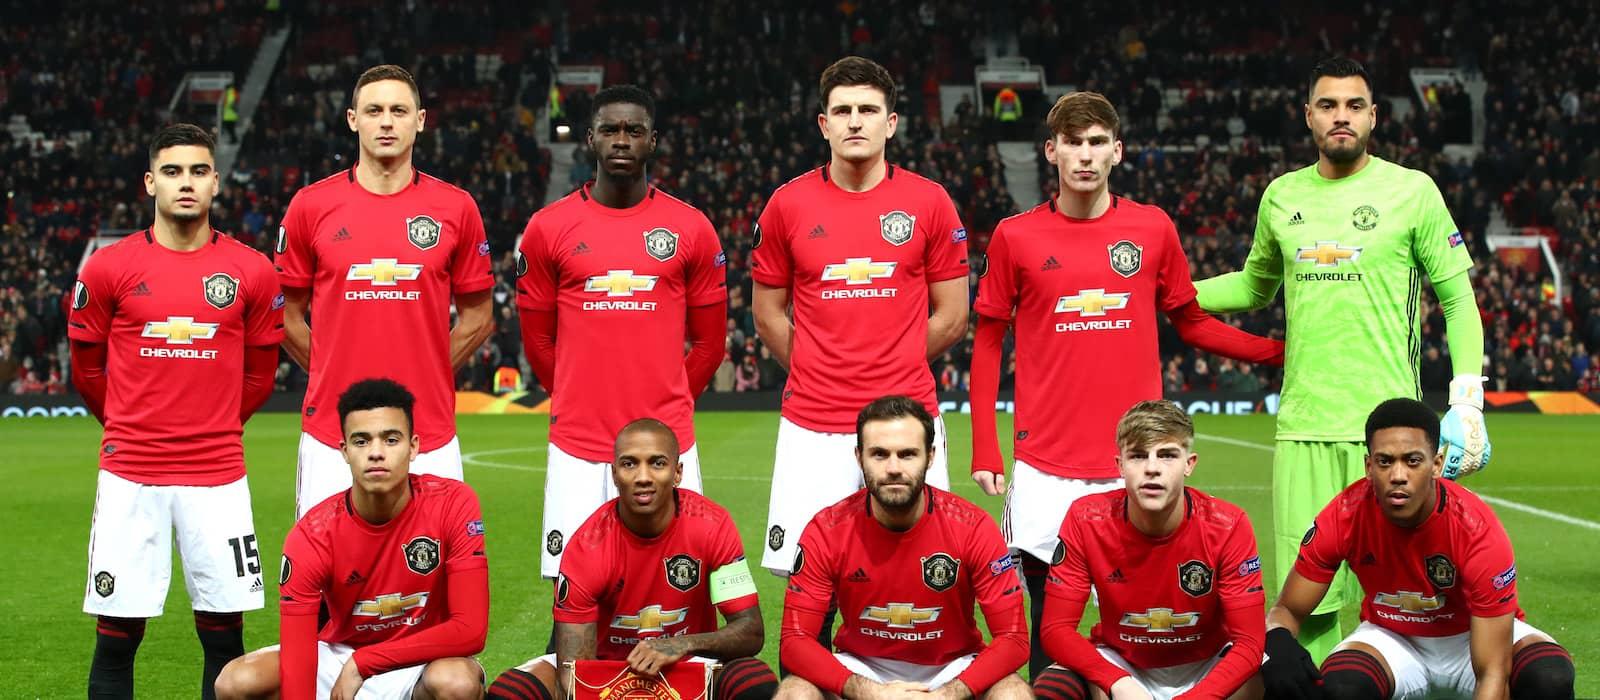 Manchester United fans react to Mason Greenwood's performance vs AZ Alkmaar